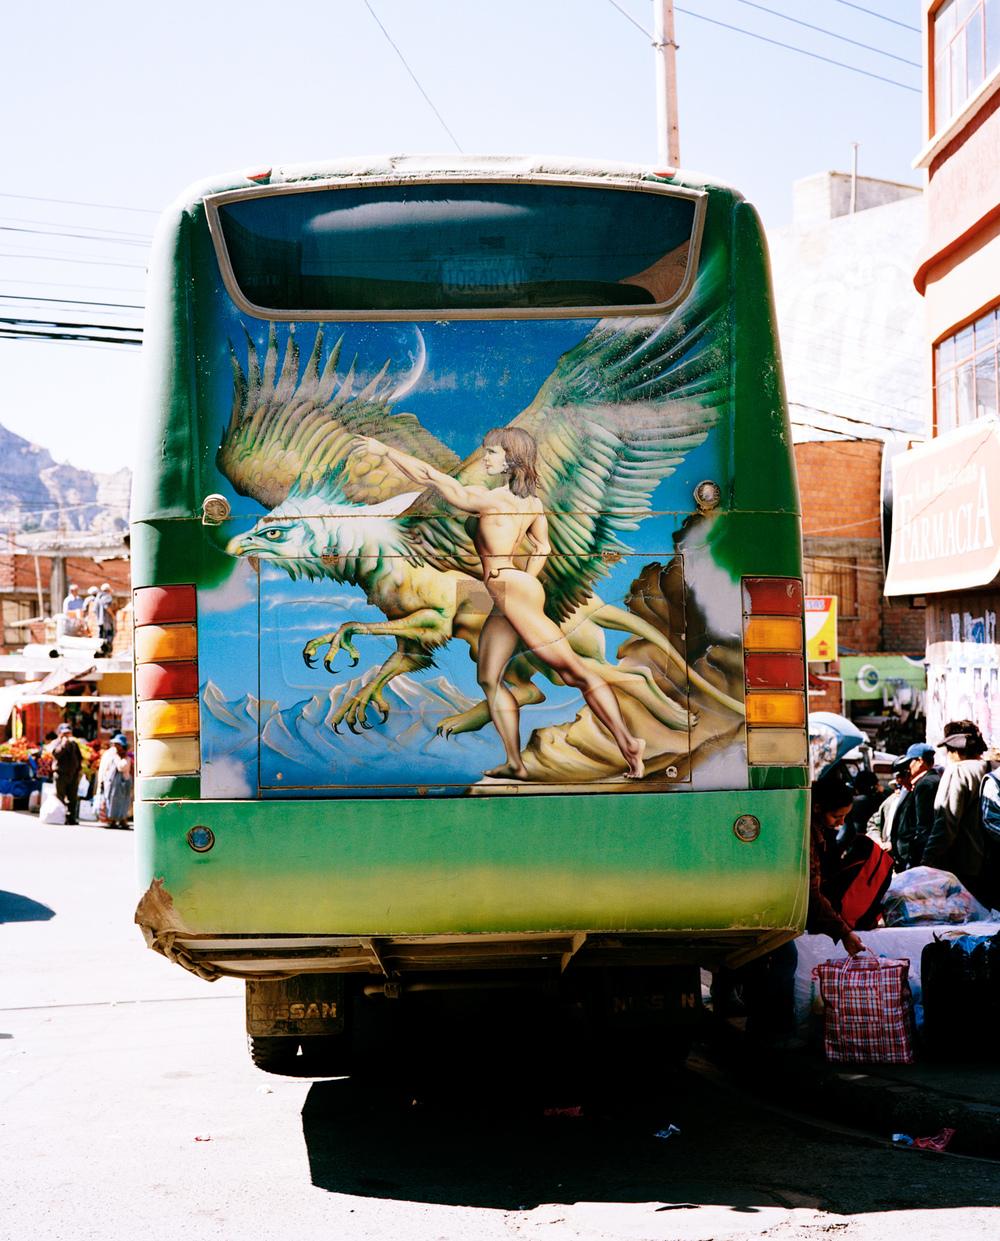 Daniel_Hofer_Bolivian_Busses_97_04_1550PX_WEB.jpg